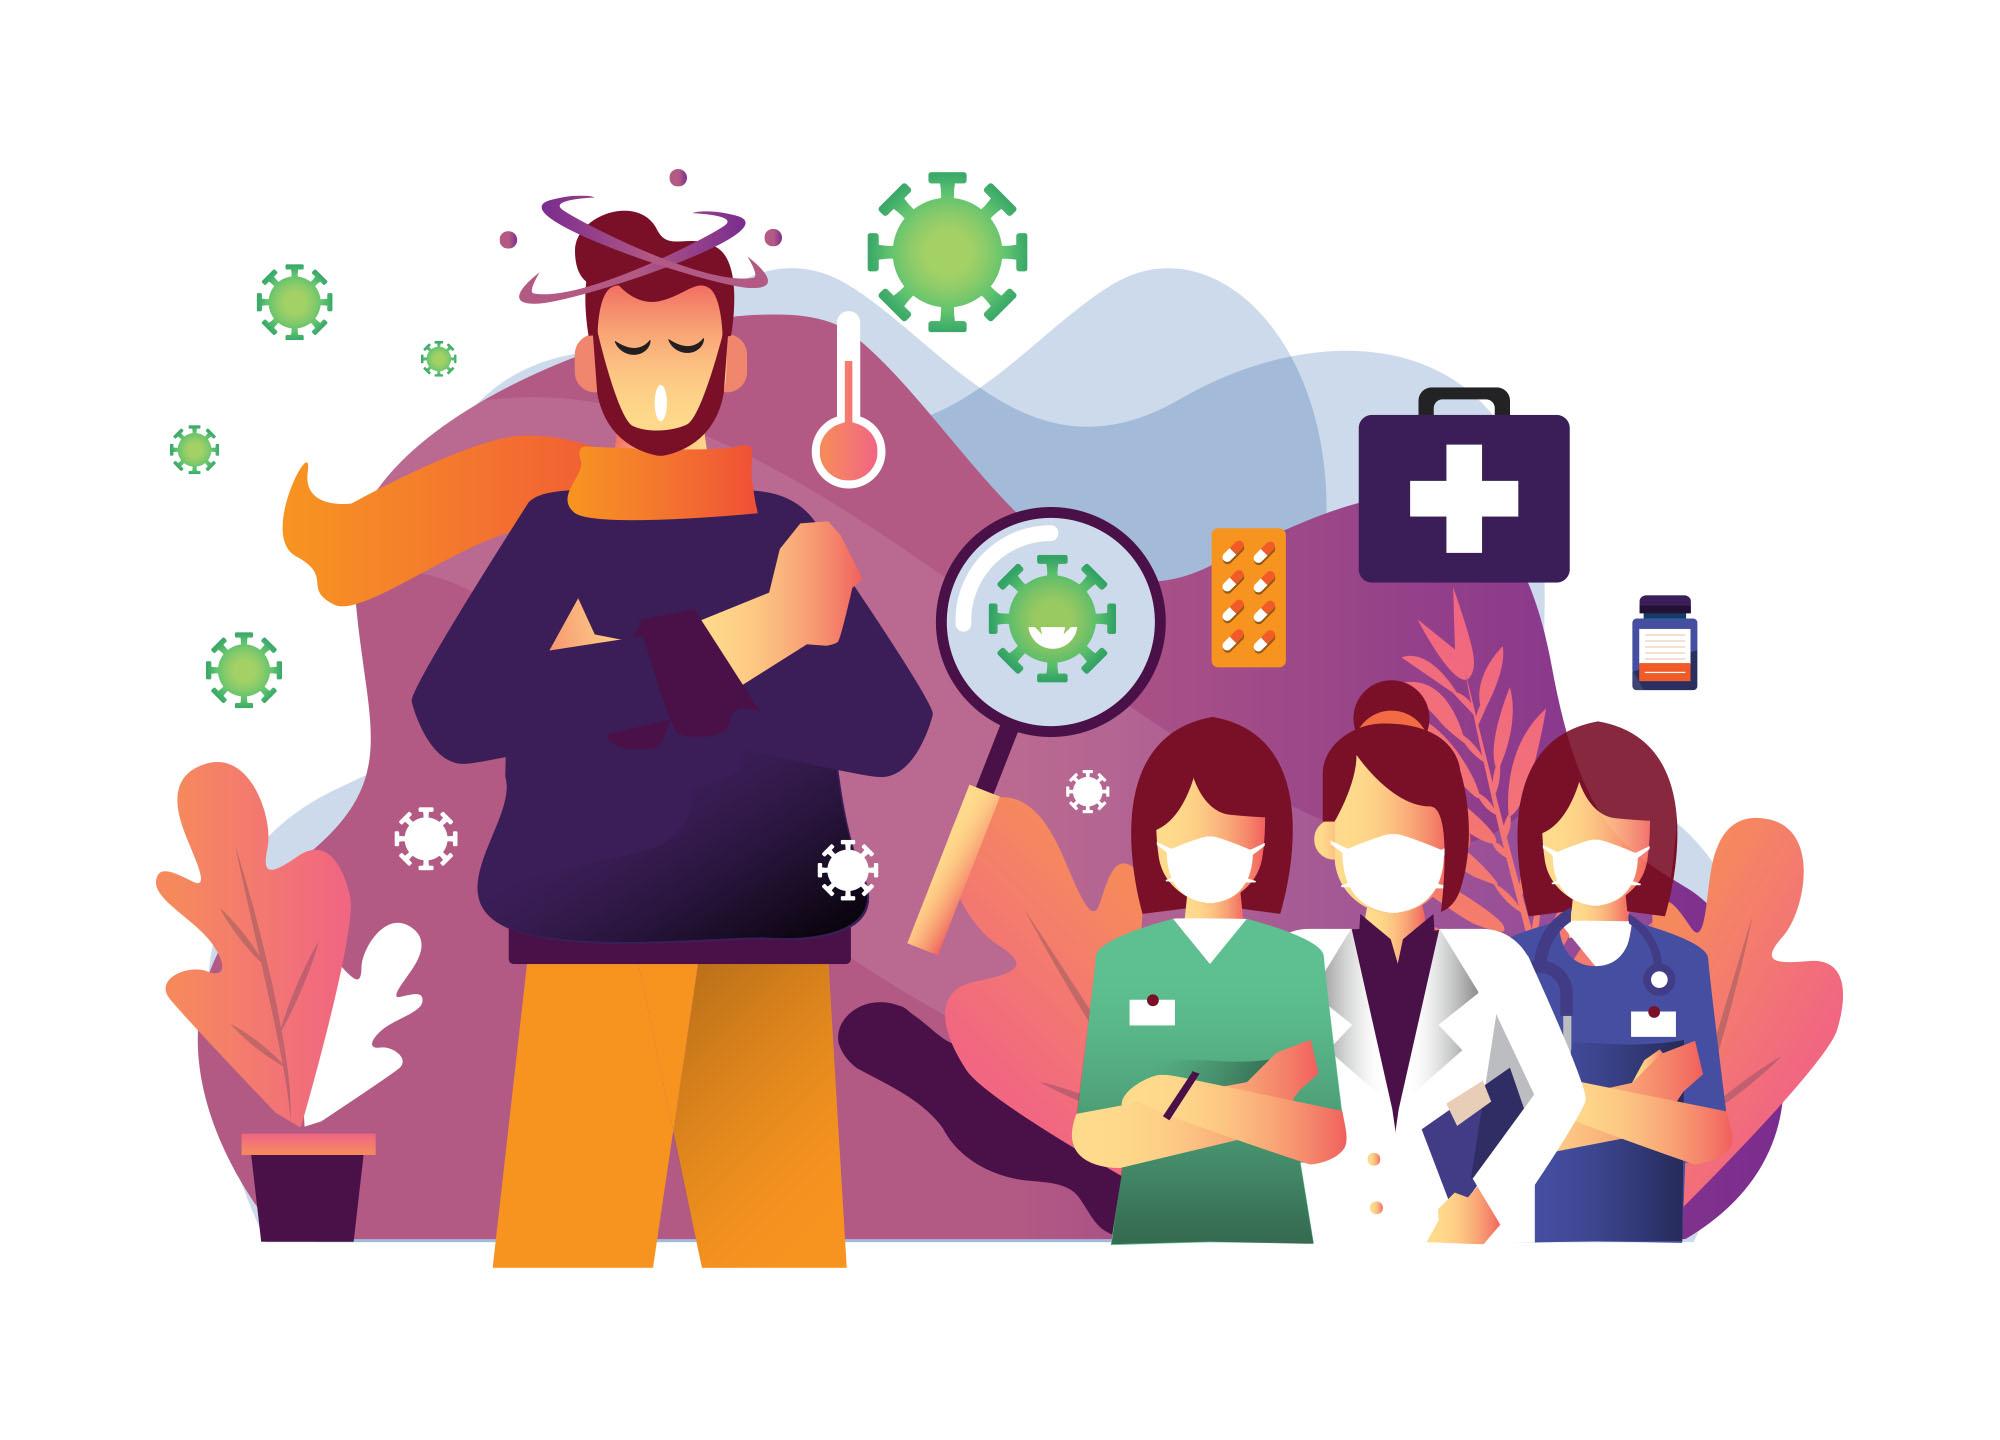 Coronavirus Pandemic Illustration